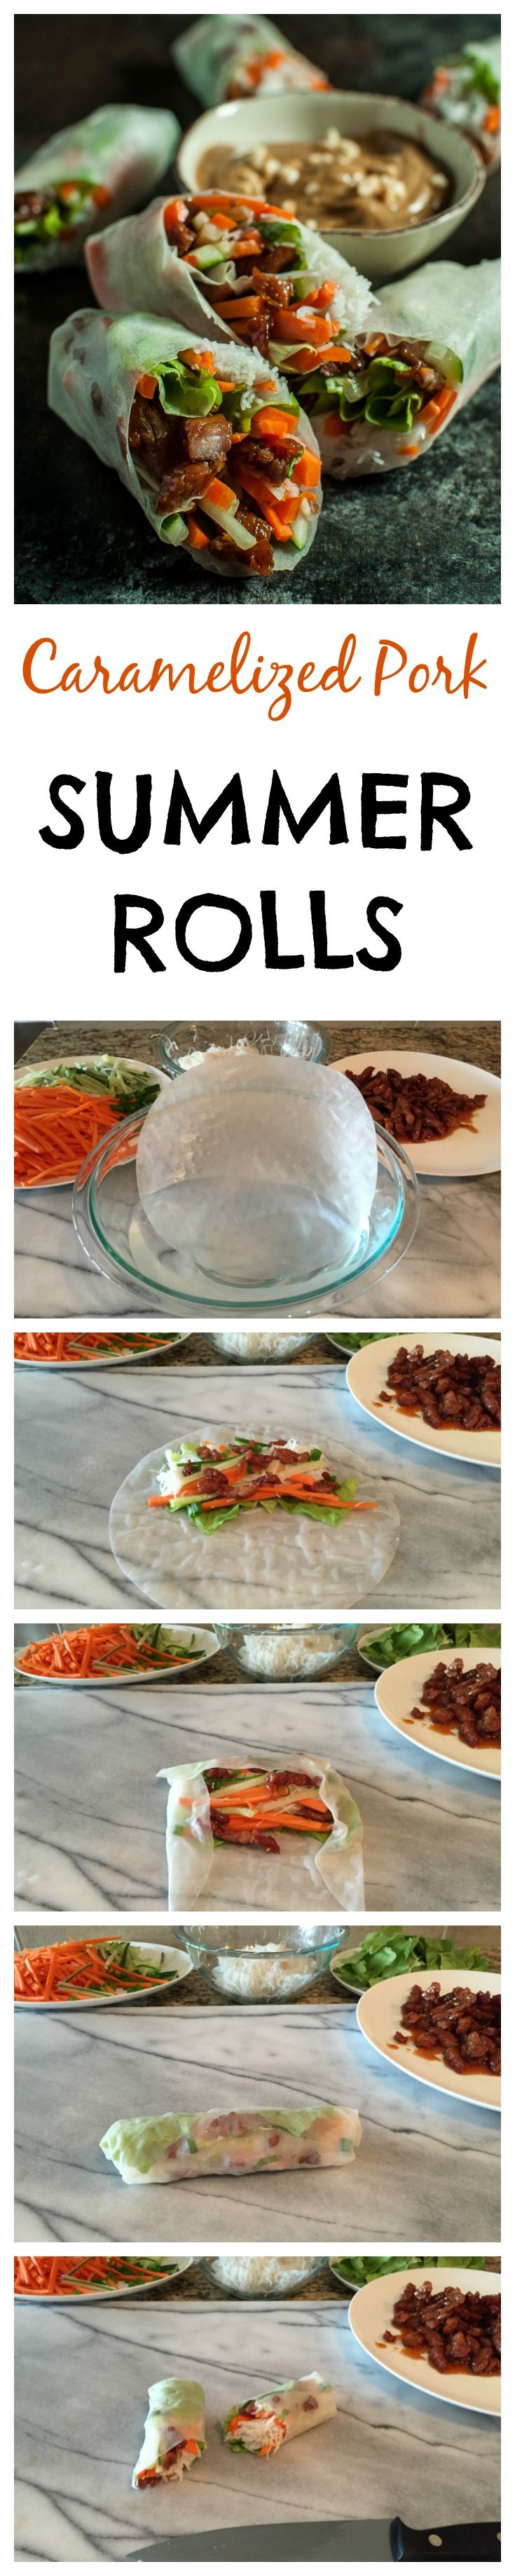 Best 25 Rice Paper Recipes Ideas On Pinterest Rice Rolls Vietnamese Spring Rolls And Spring Rolls Restaurant